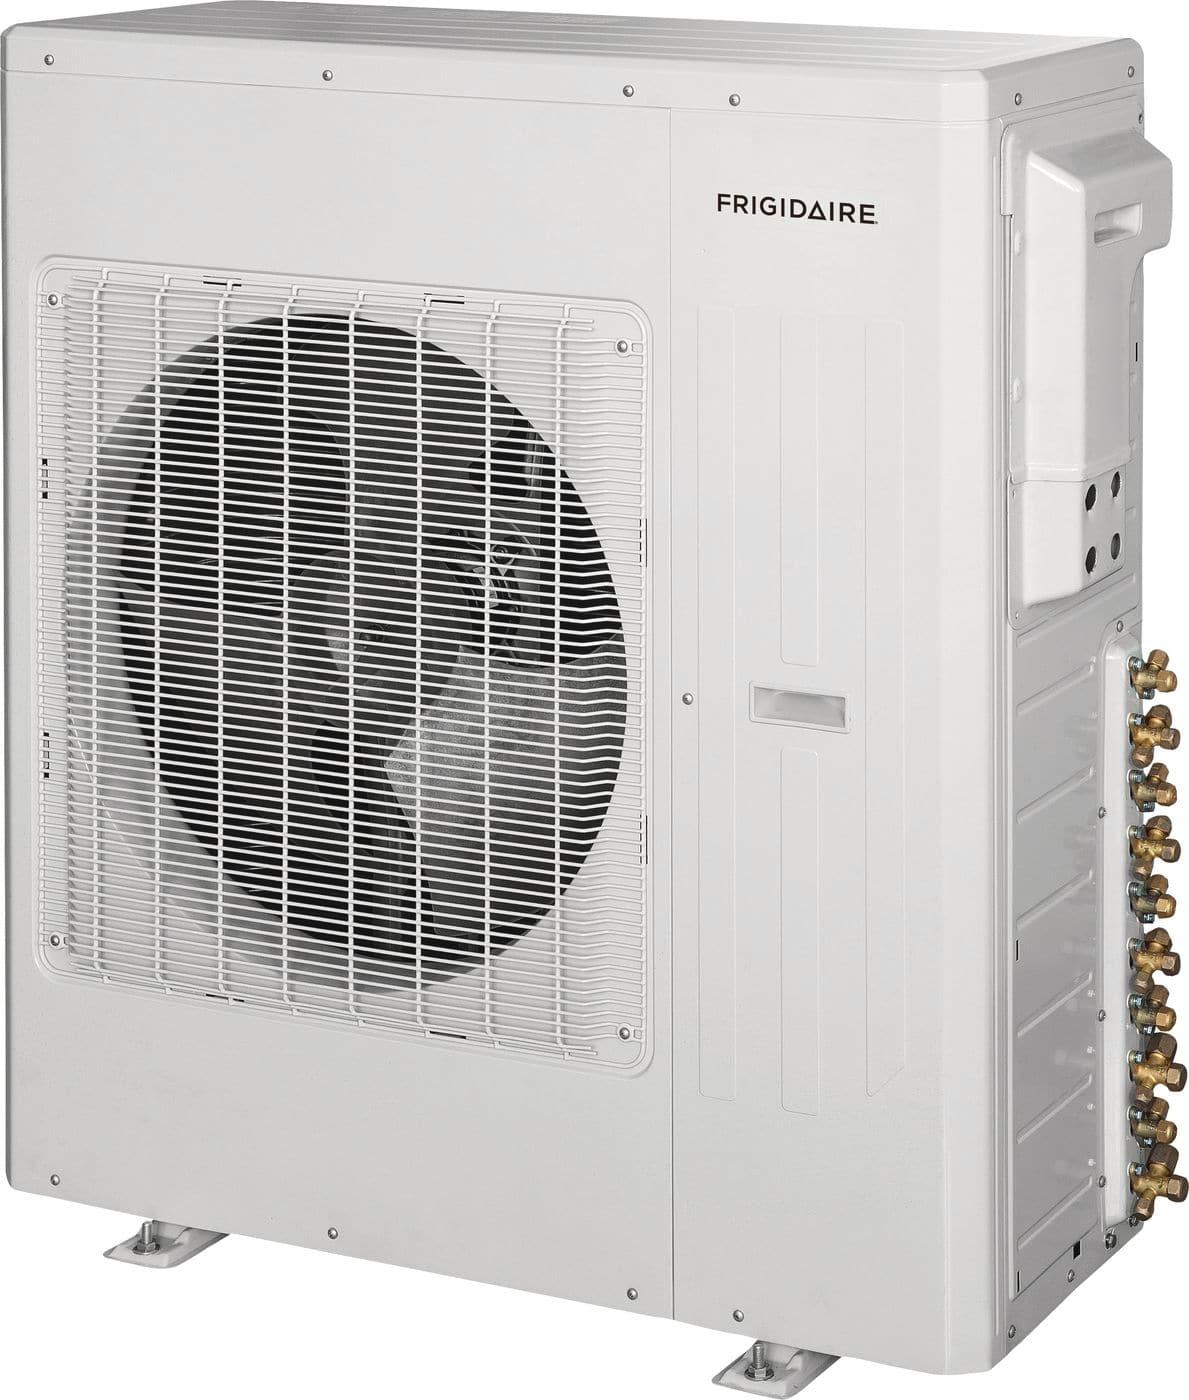 Model: FFHP362ZQ2 | Frigidaire Ductless Split Air Conditioner with Heat Pump, 34,400btu 208/230volt